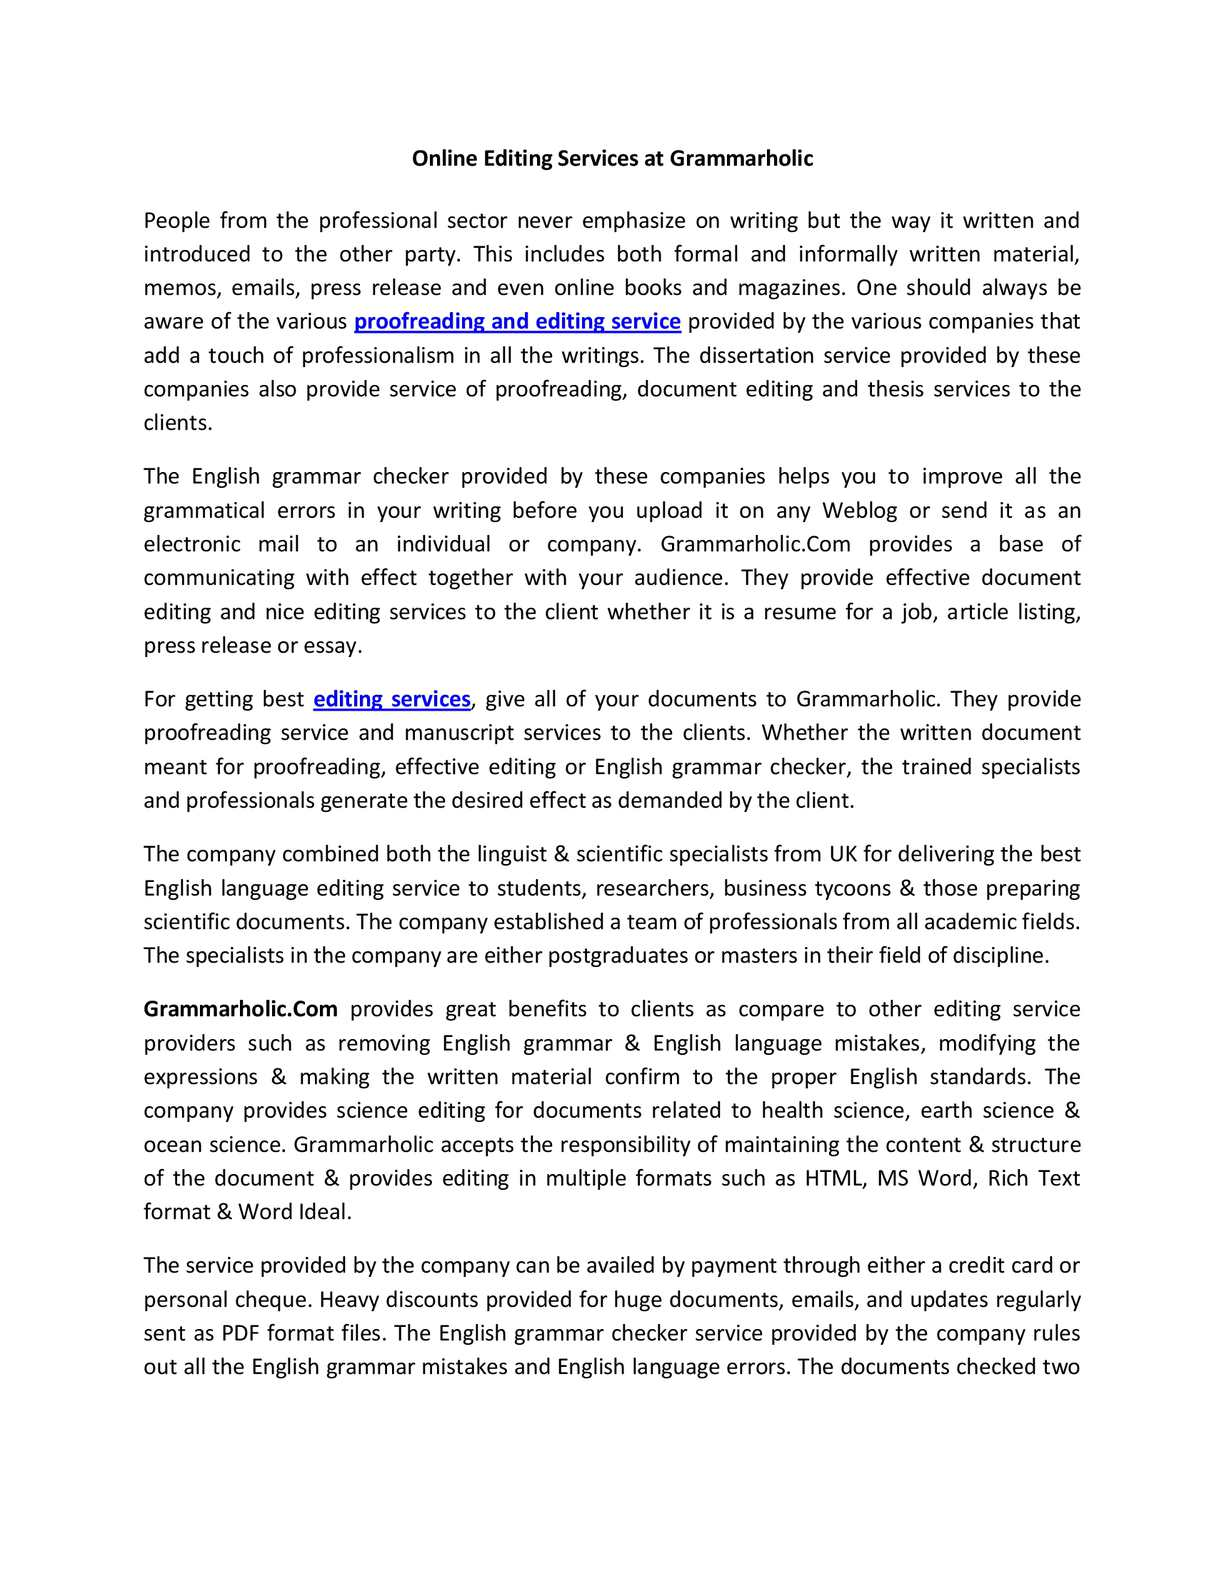 Calaméo - Online Editing Services at Grammarholic